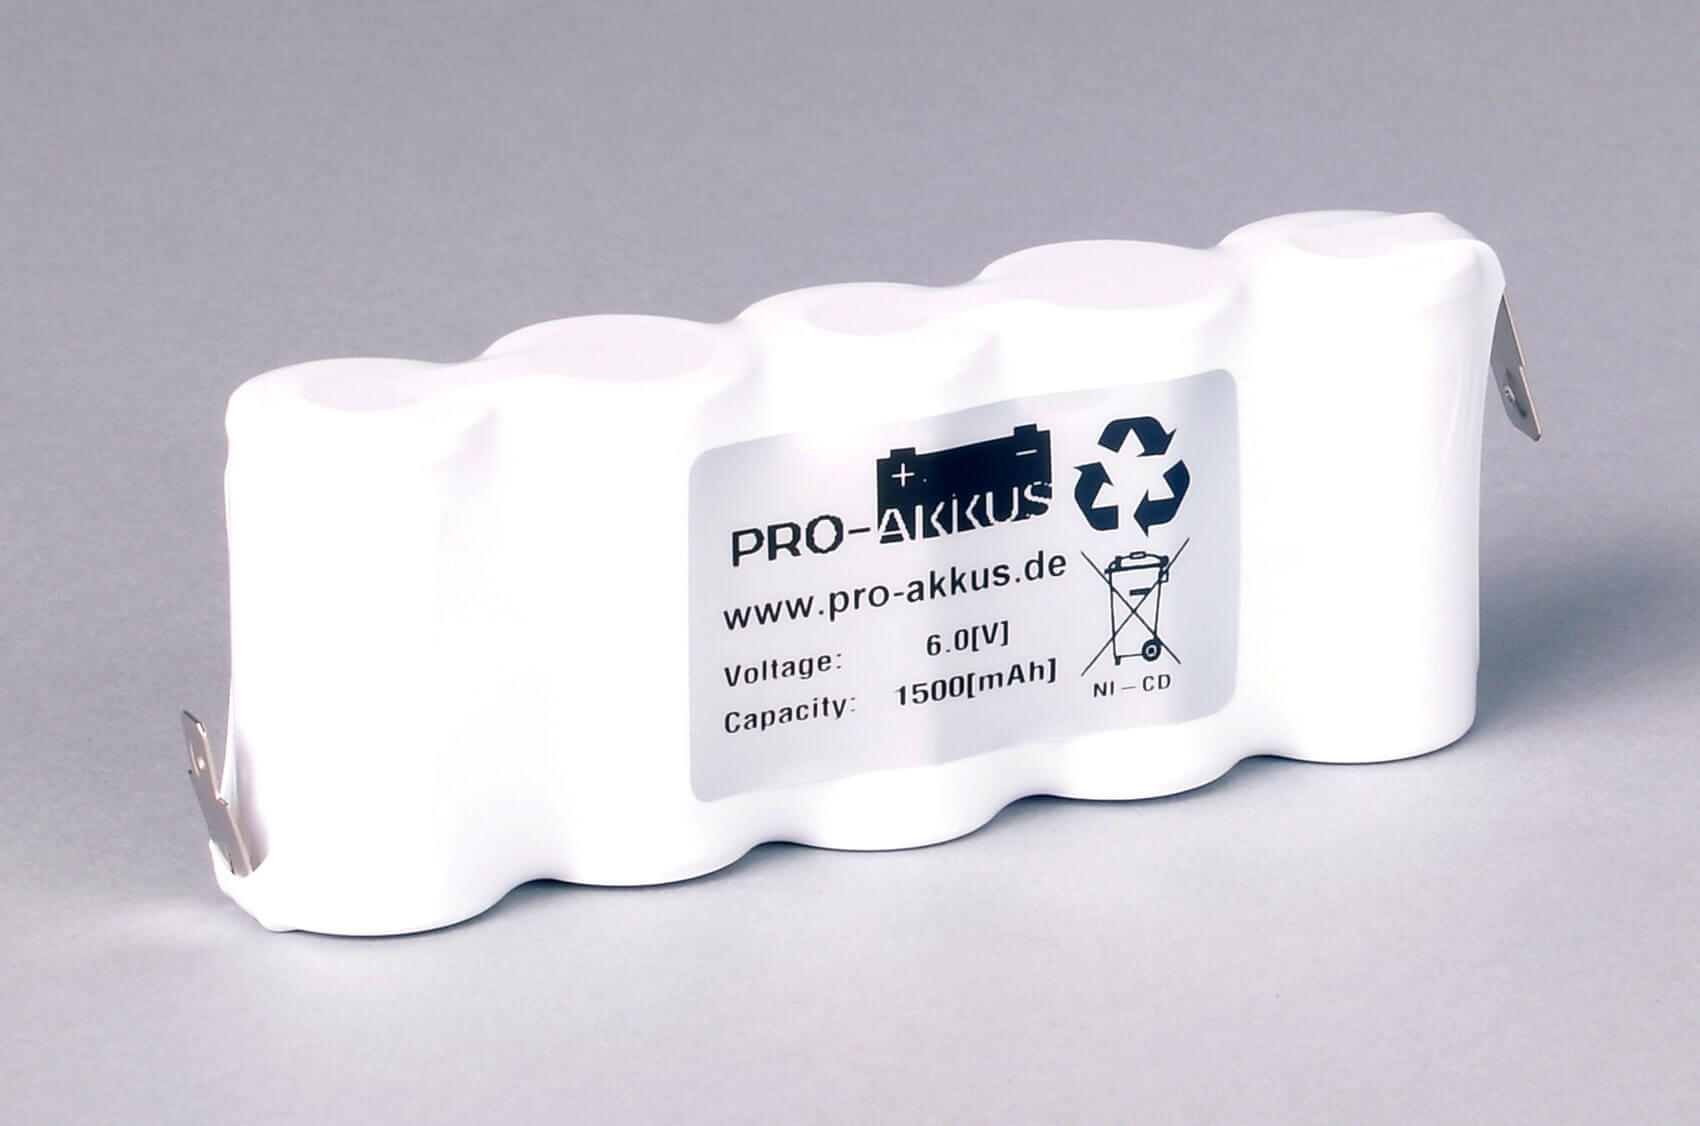 Ni-Cd Akkupack Notlicht Notbeleuchtung 6,0V / 1500mAh (1,5Ah) F5x1 Reihe, Faston Anschlüsse